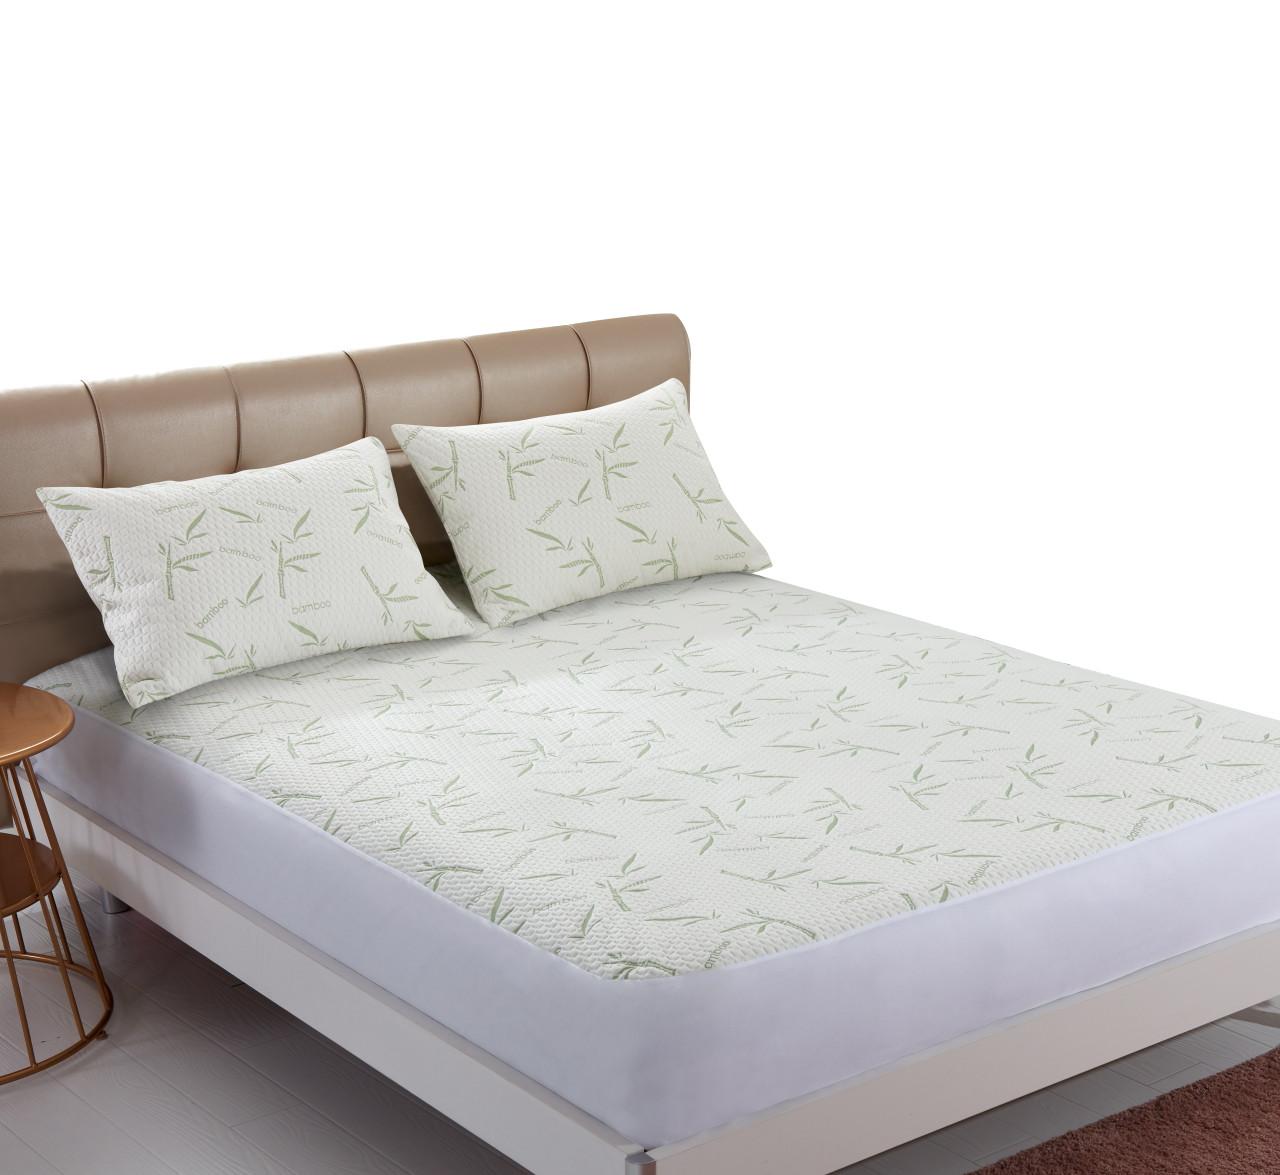 Nature Basics Bamboo Waterproof Mattress Protector Queen Bed Size